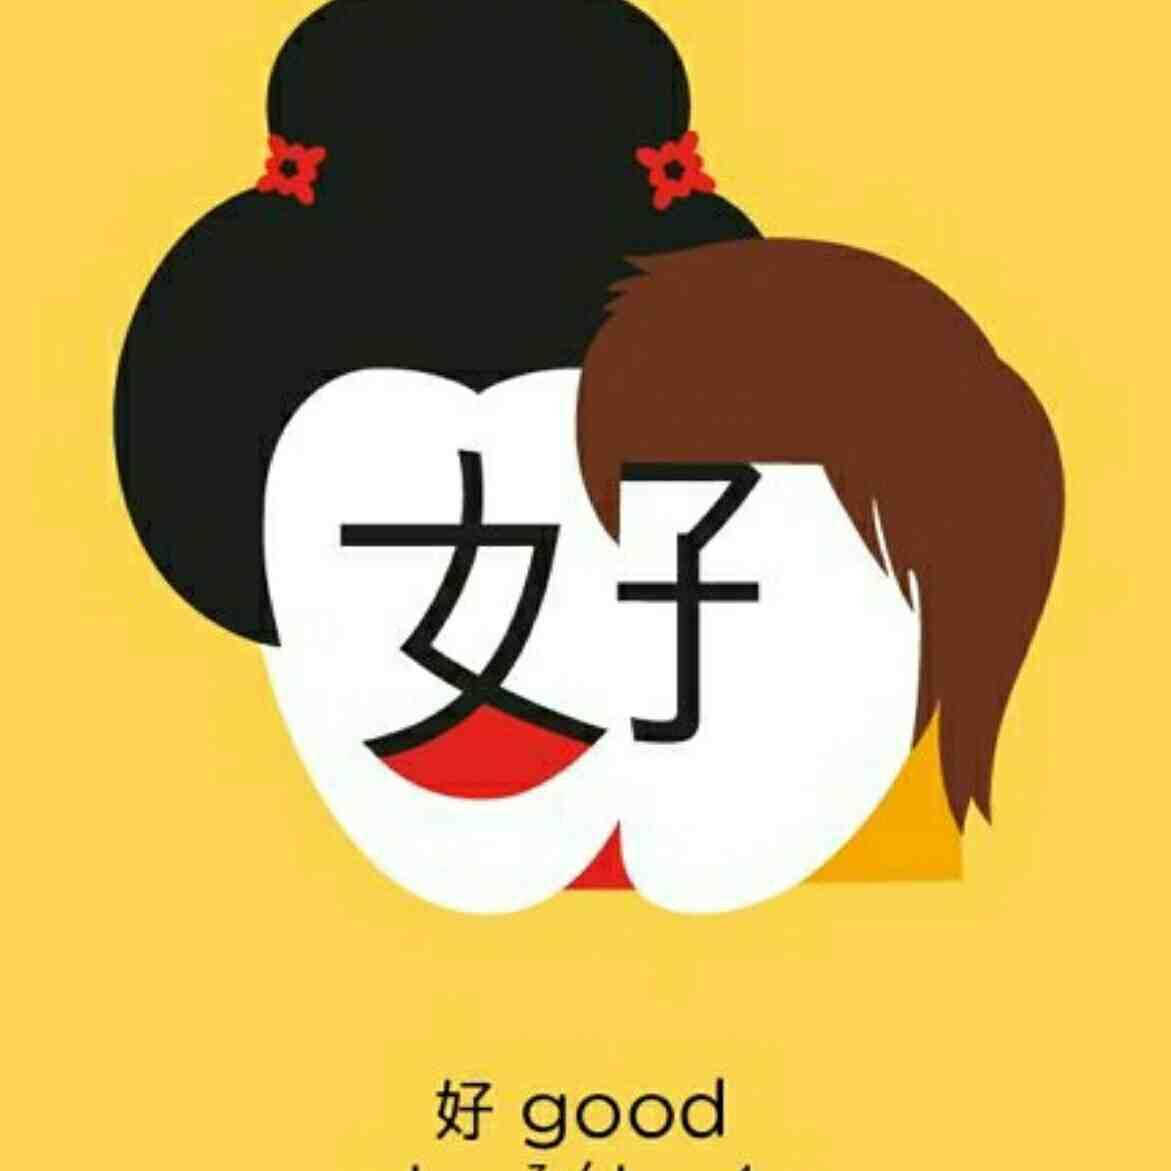 Foto: Belajar Bahasa Mandarin Dan English